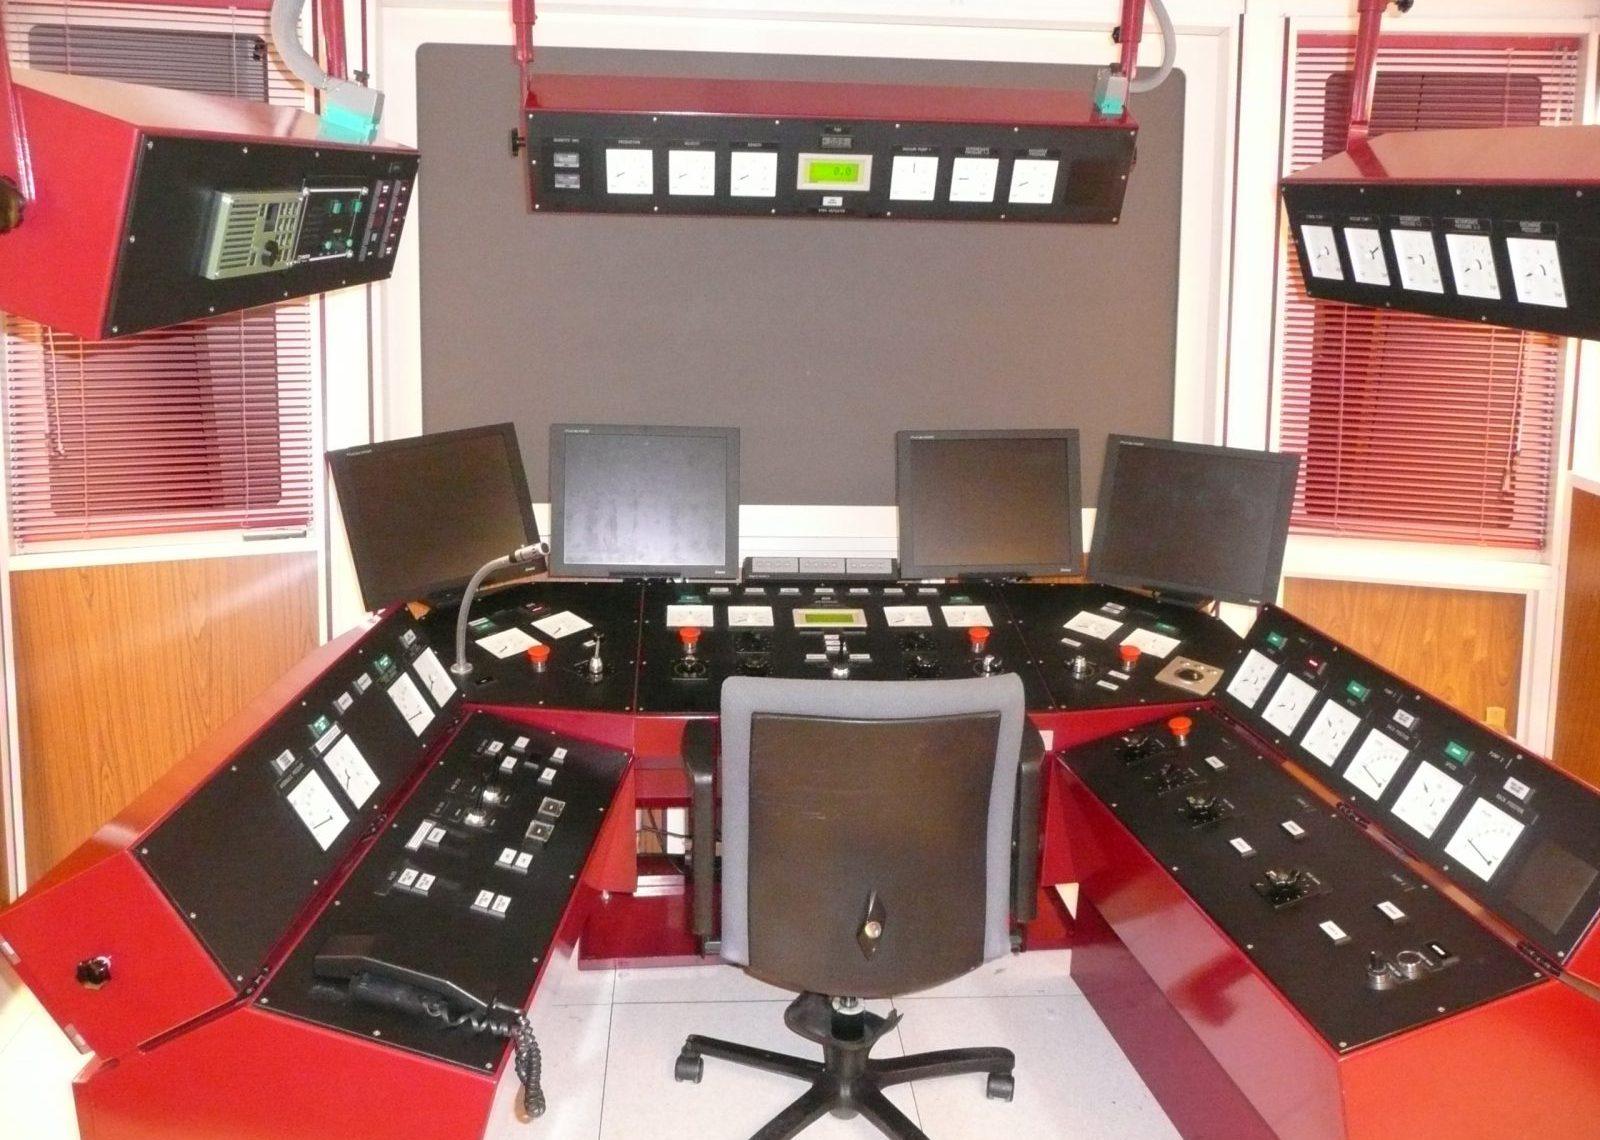 Control centre simulator